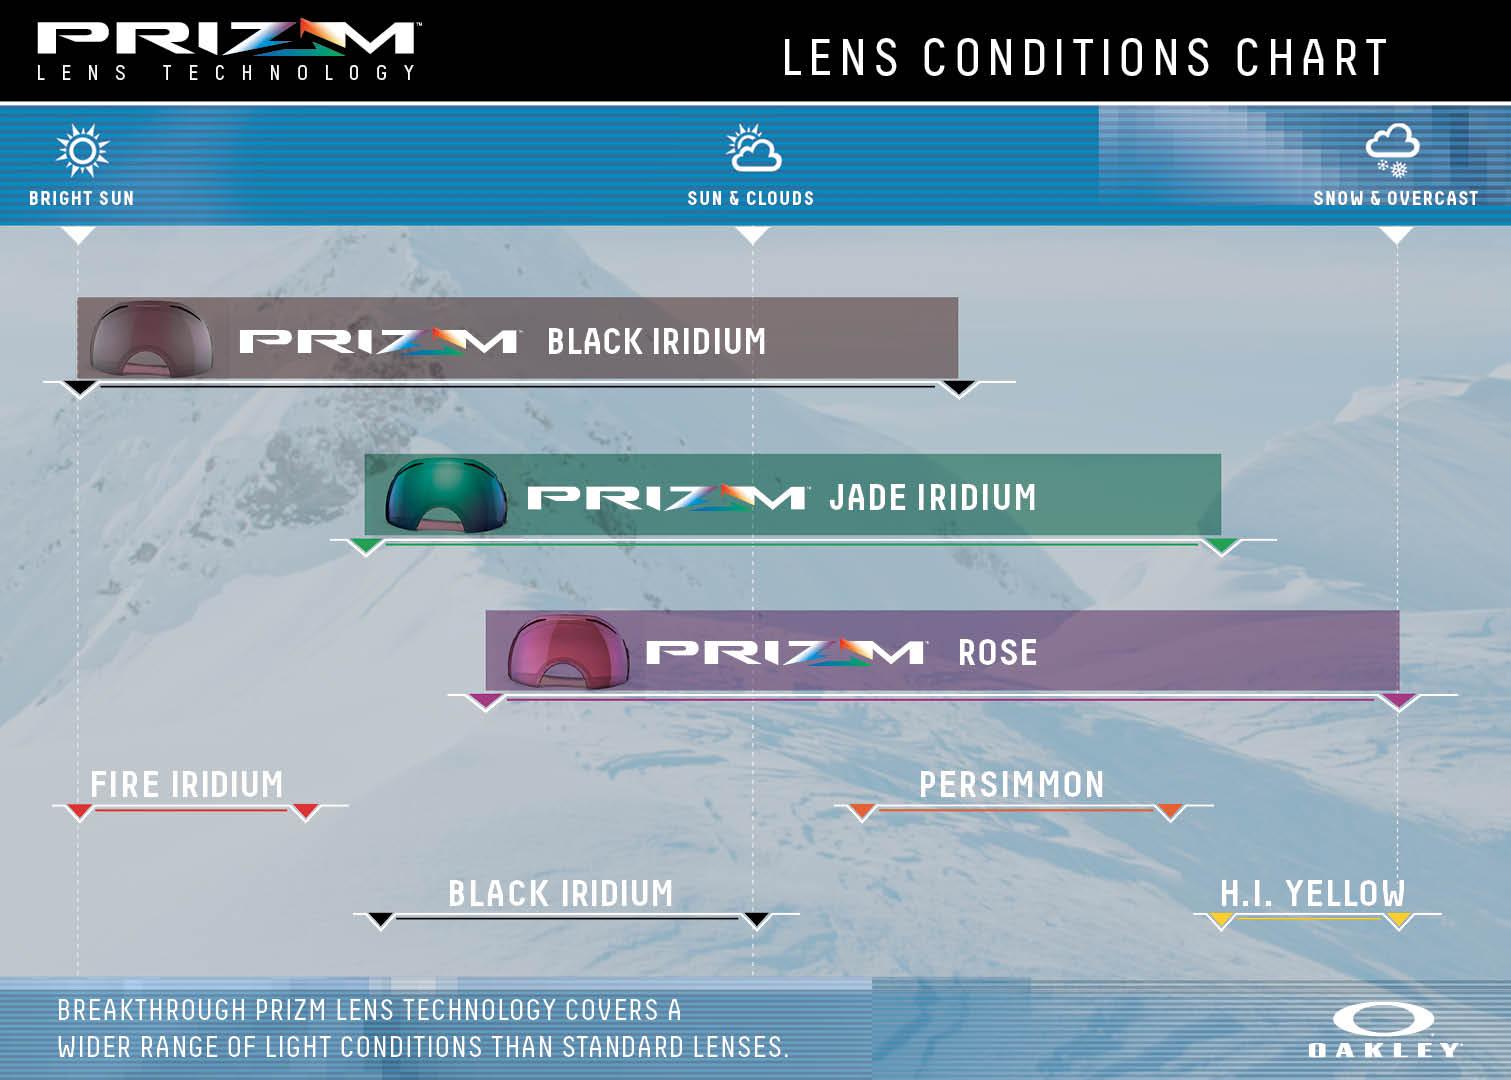 oakley snow goggles prizm  Oakley Flight Deck Matte Black with Prizm Jade Iridium Lens 拢170.00